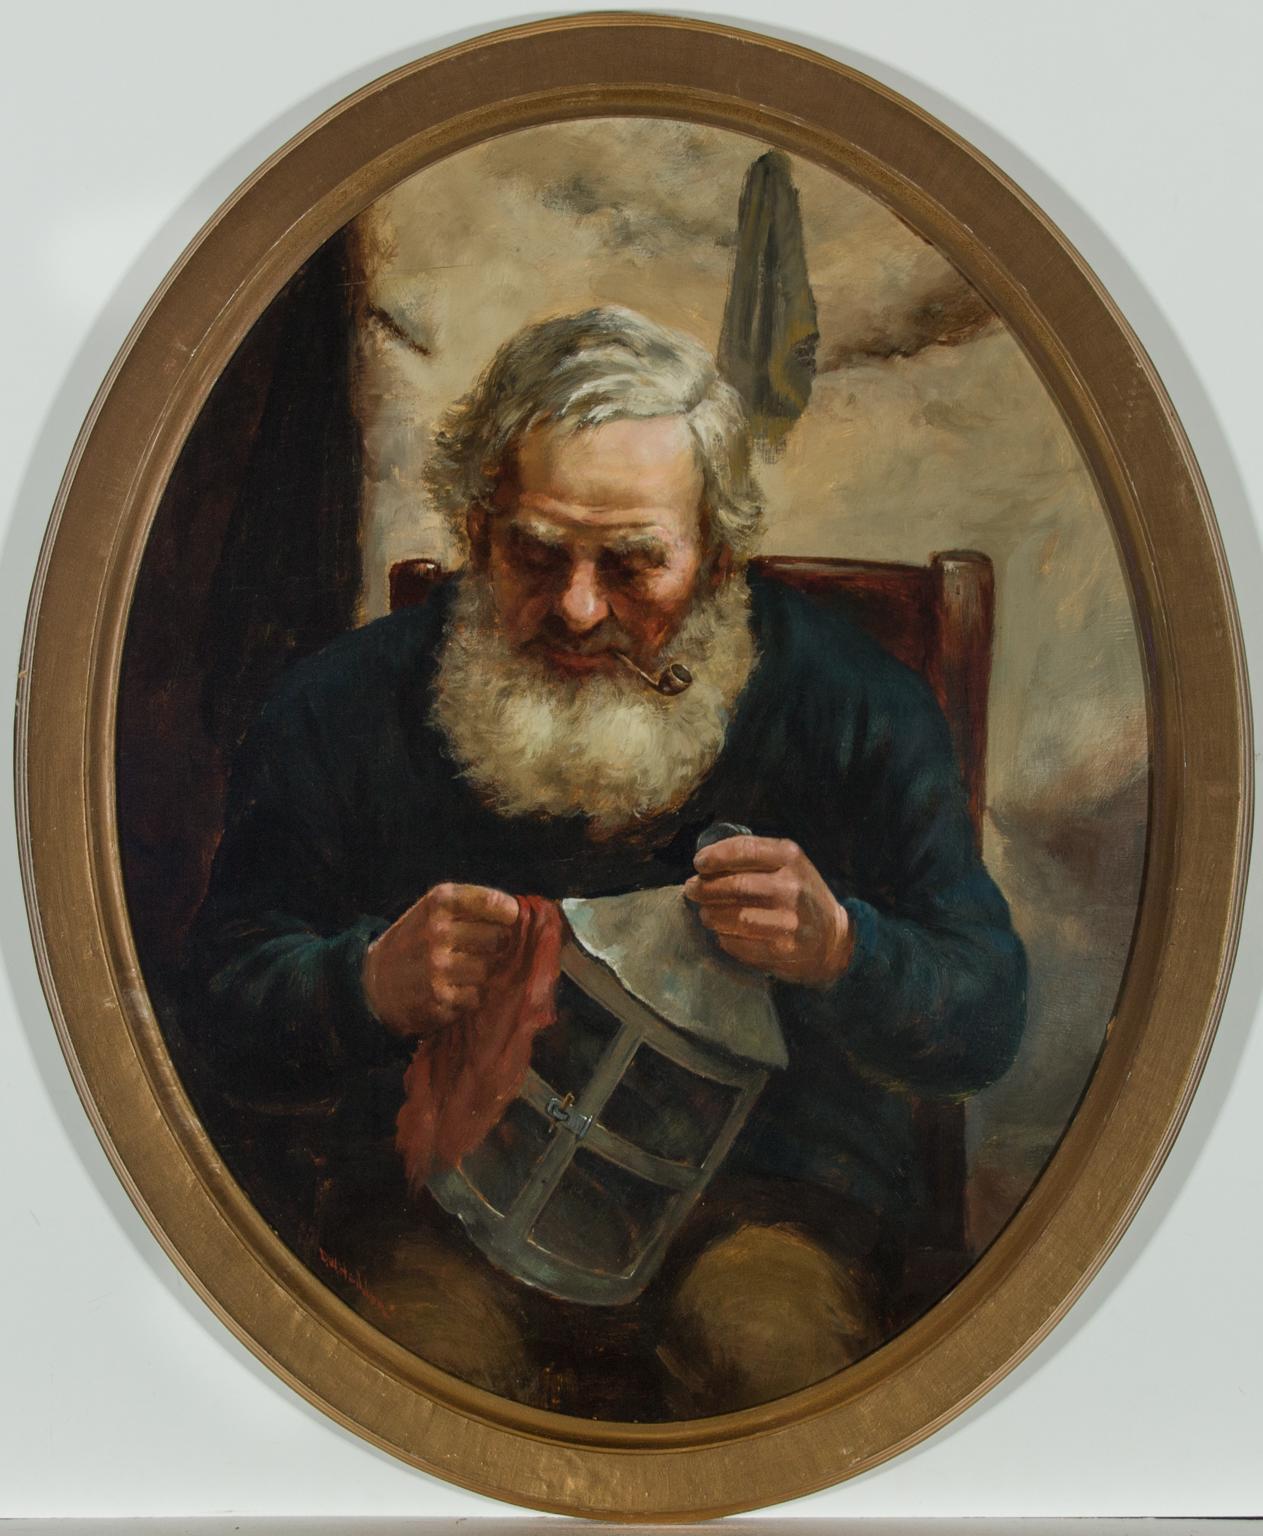 David W. Haddon (fl. 1884-1911) - English Oil, Portrait of a Cornish Fisherman